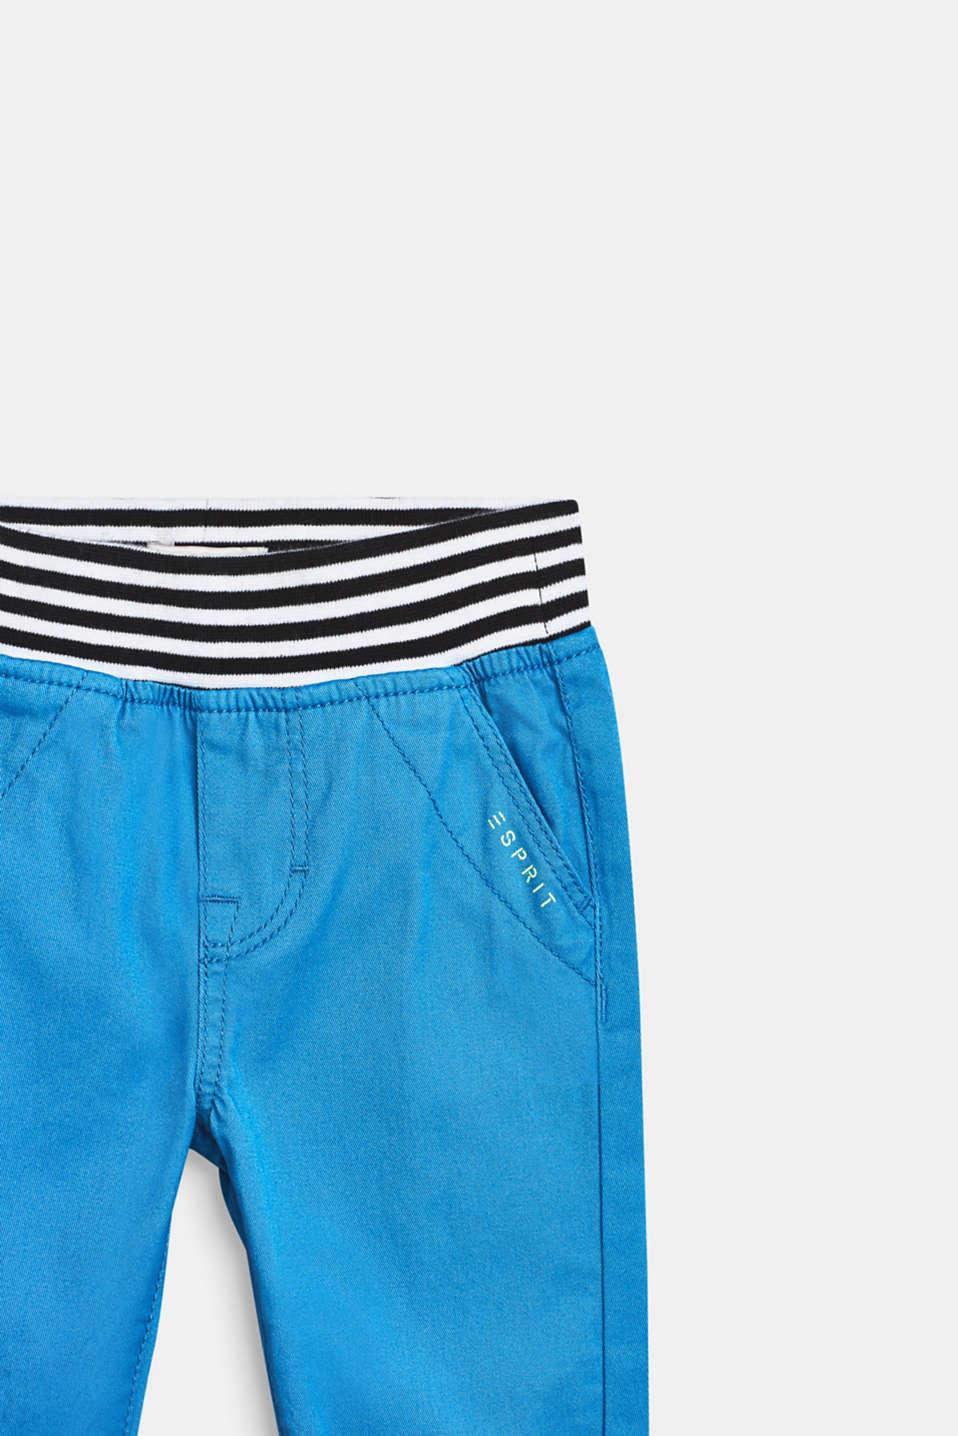 Pants woven, LCAZUR BLUE, detail image number 1